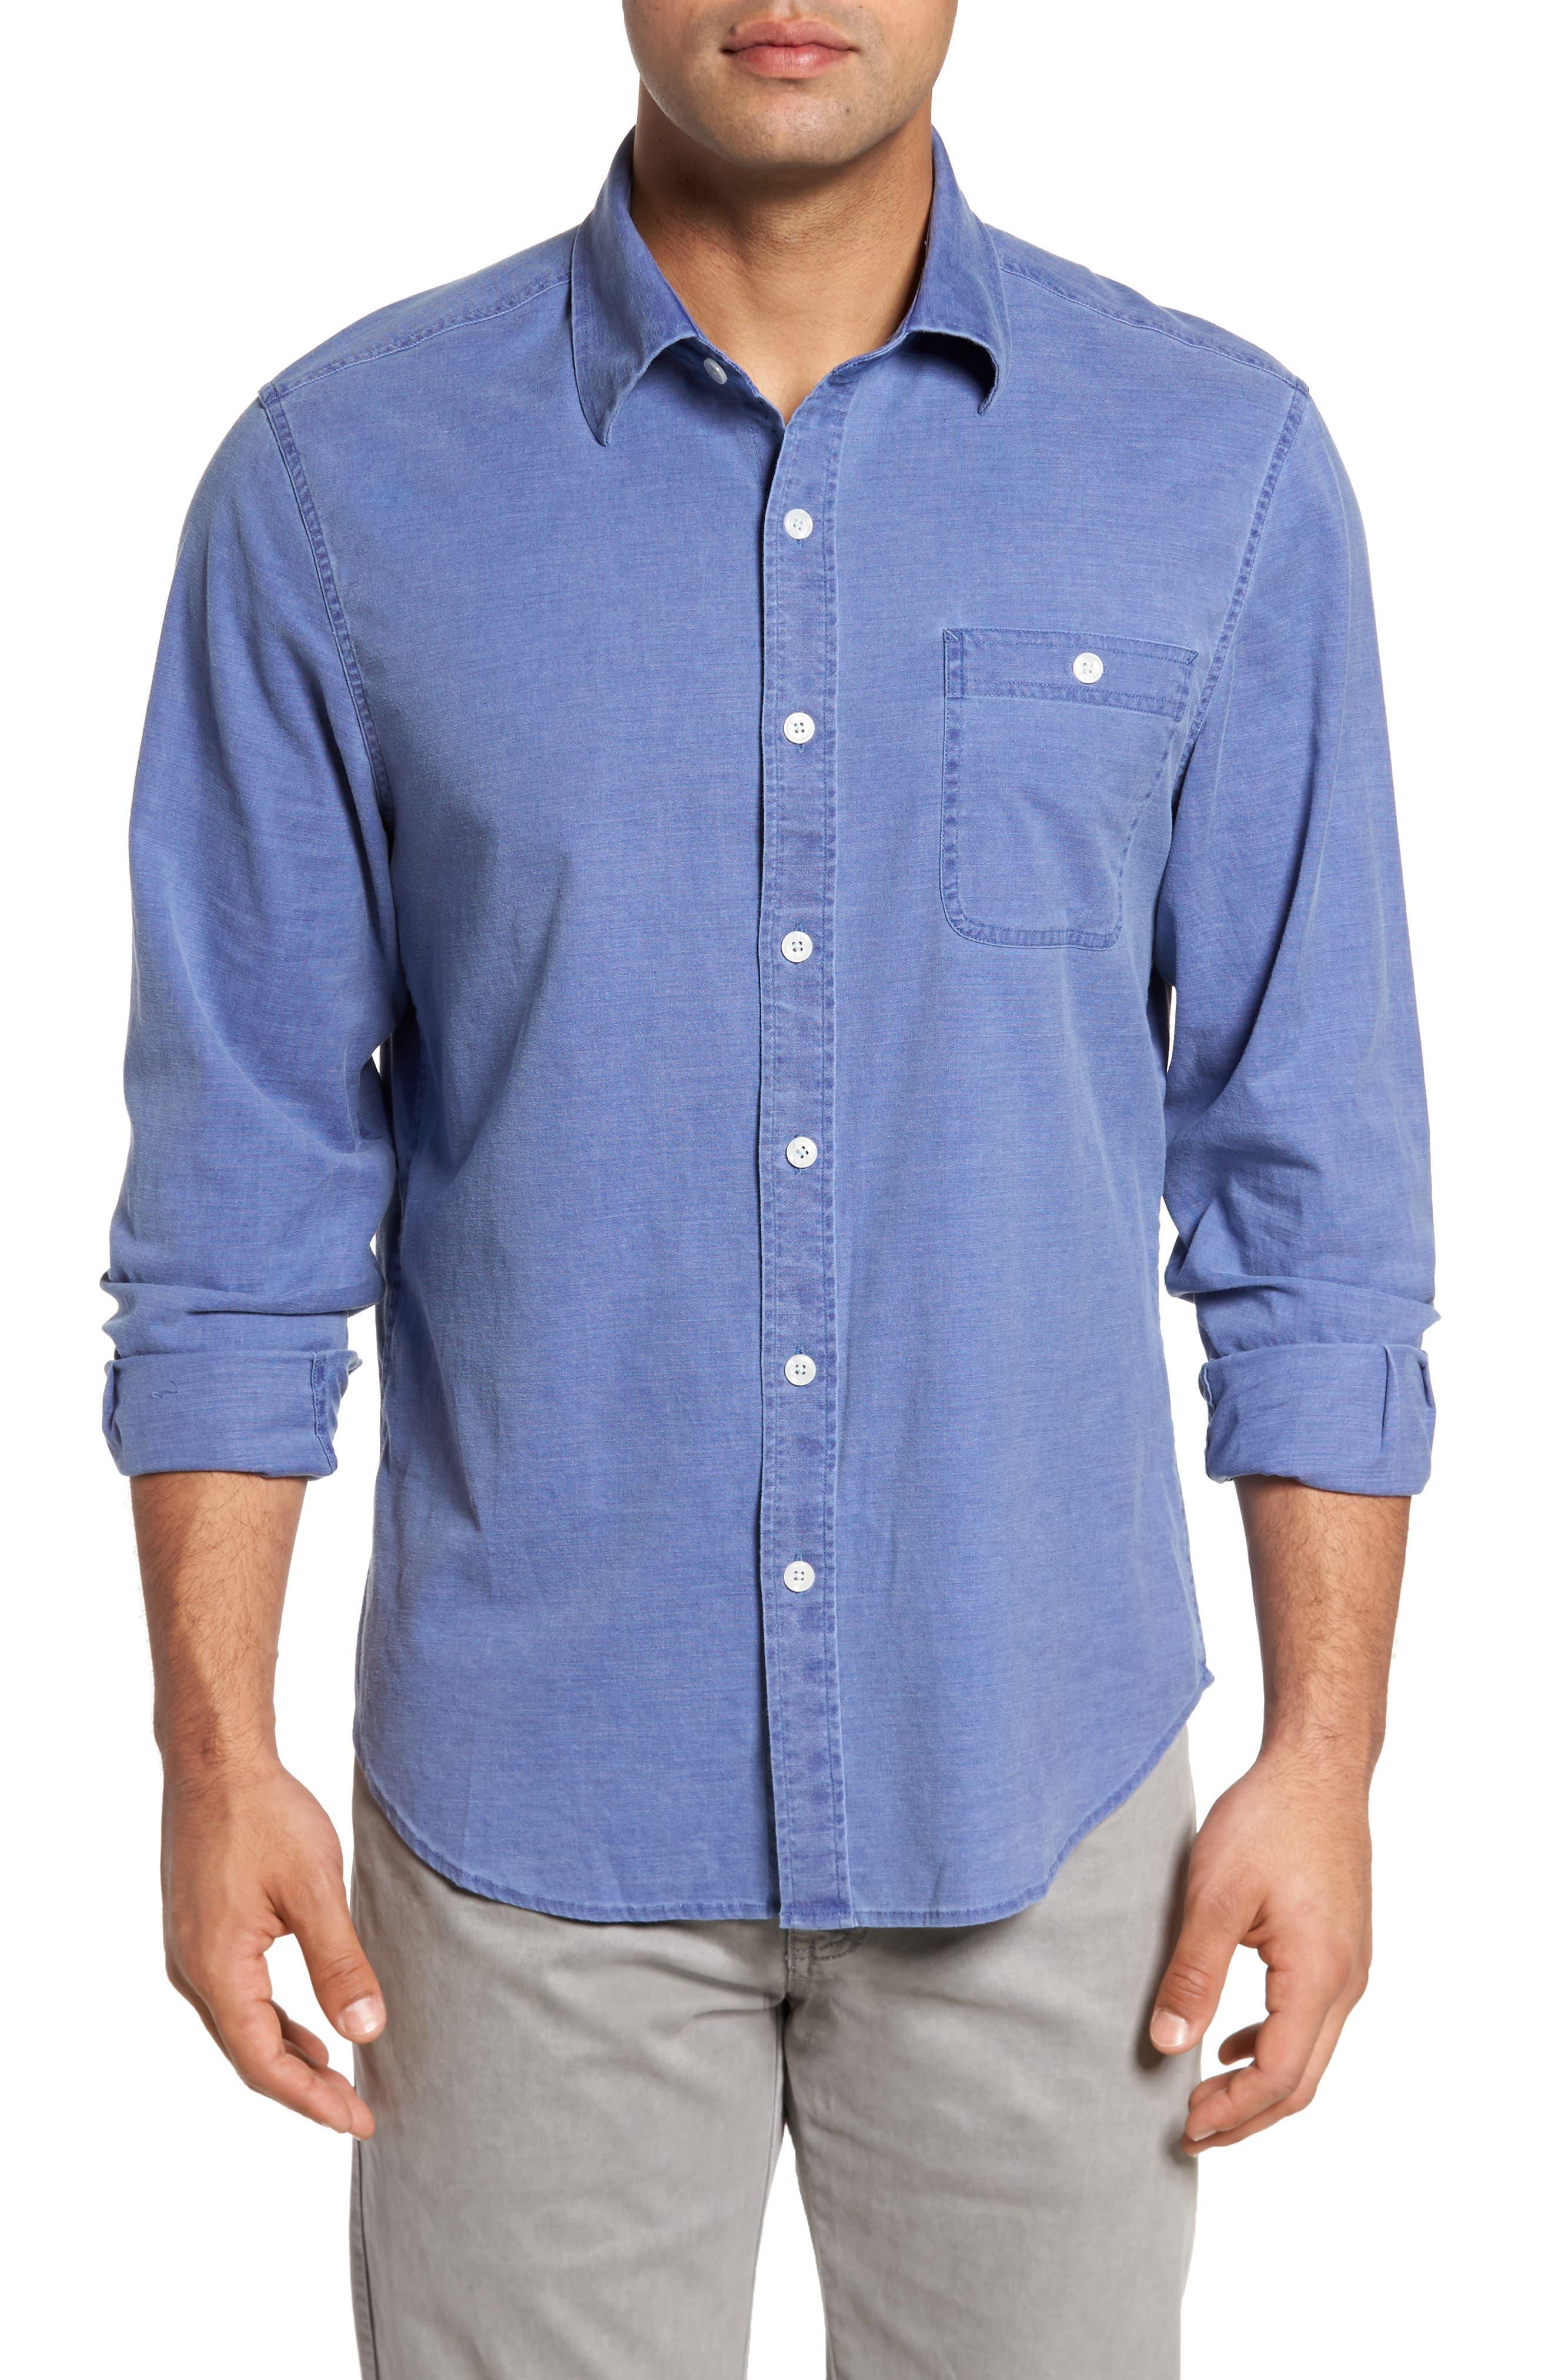 Four Seasons Sport Shirt,                         Main,                         color, Midnight